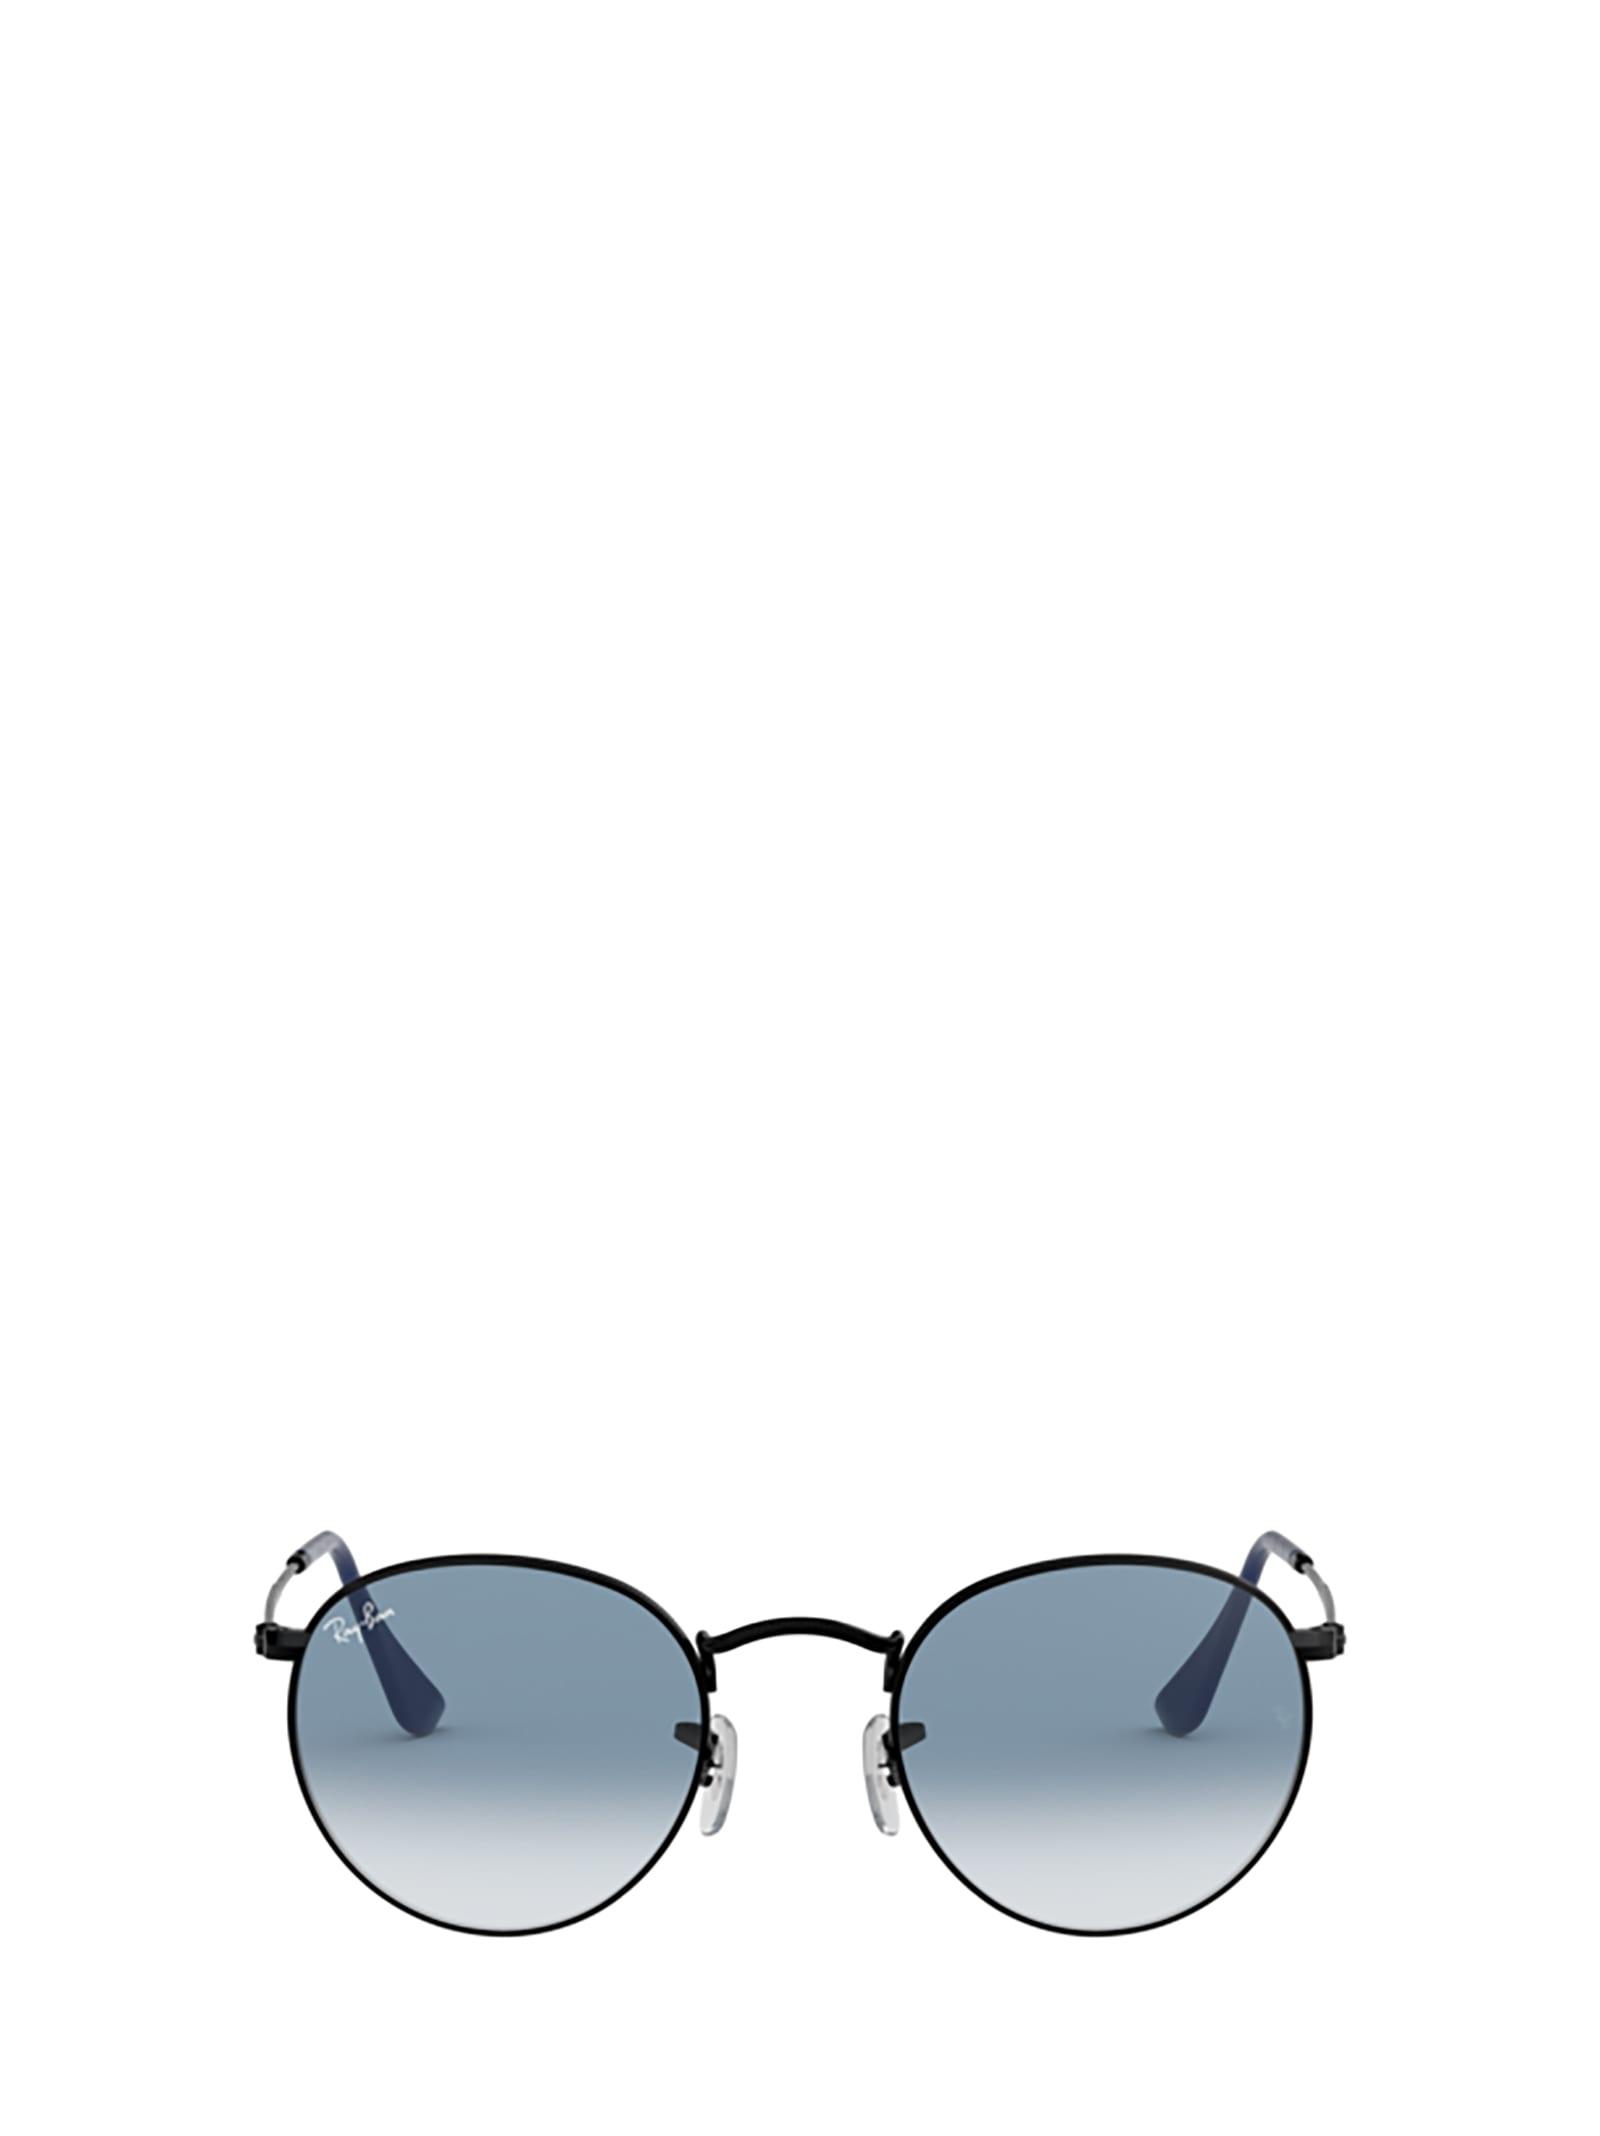 Ray-Ban Ray-ban Rb3447 Matte Black Sunglasses